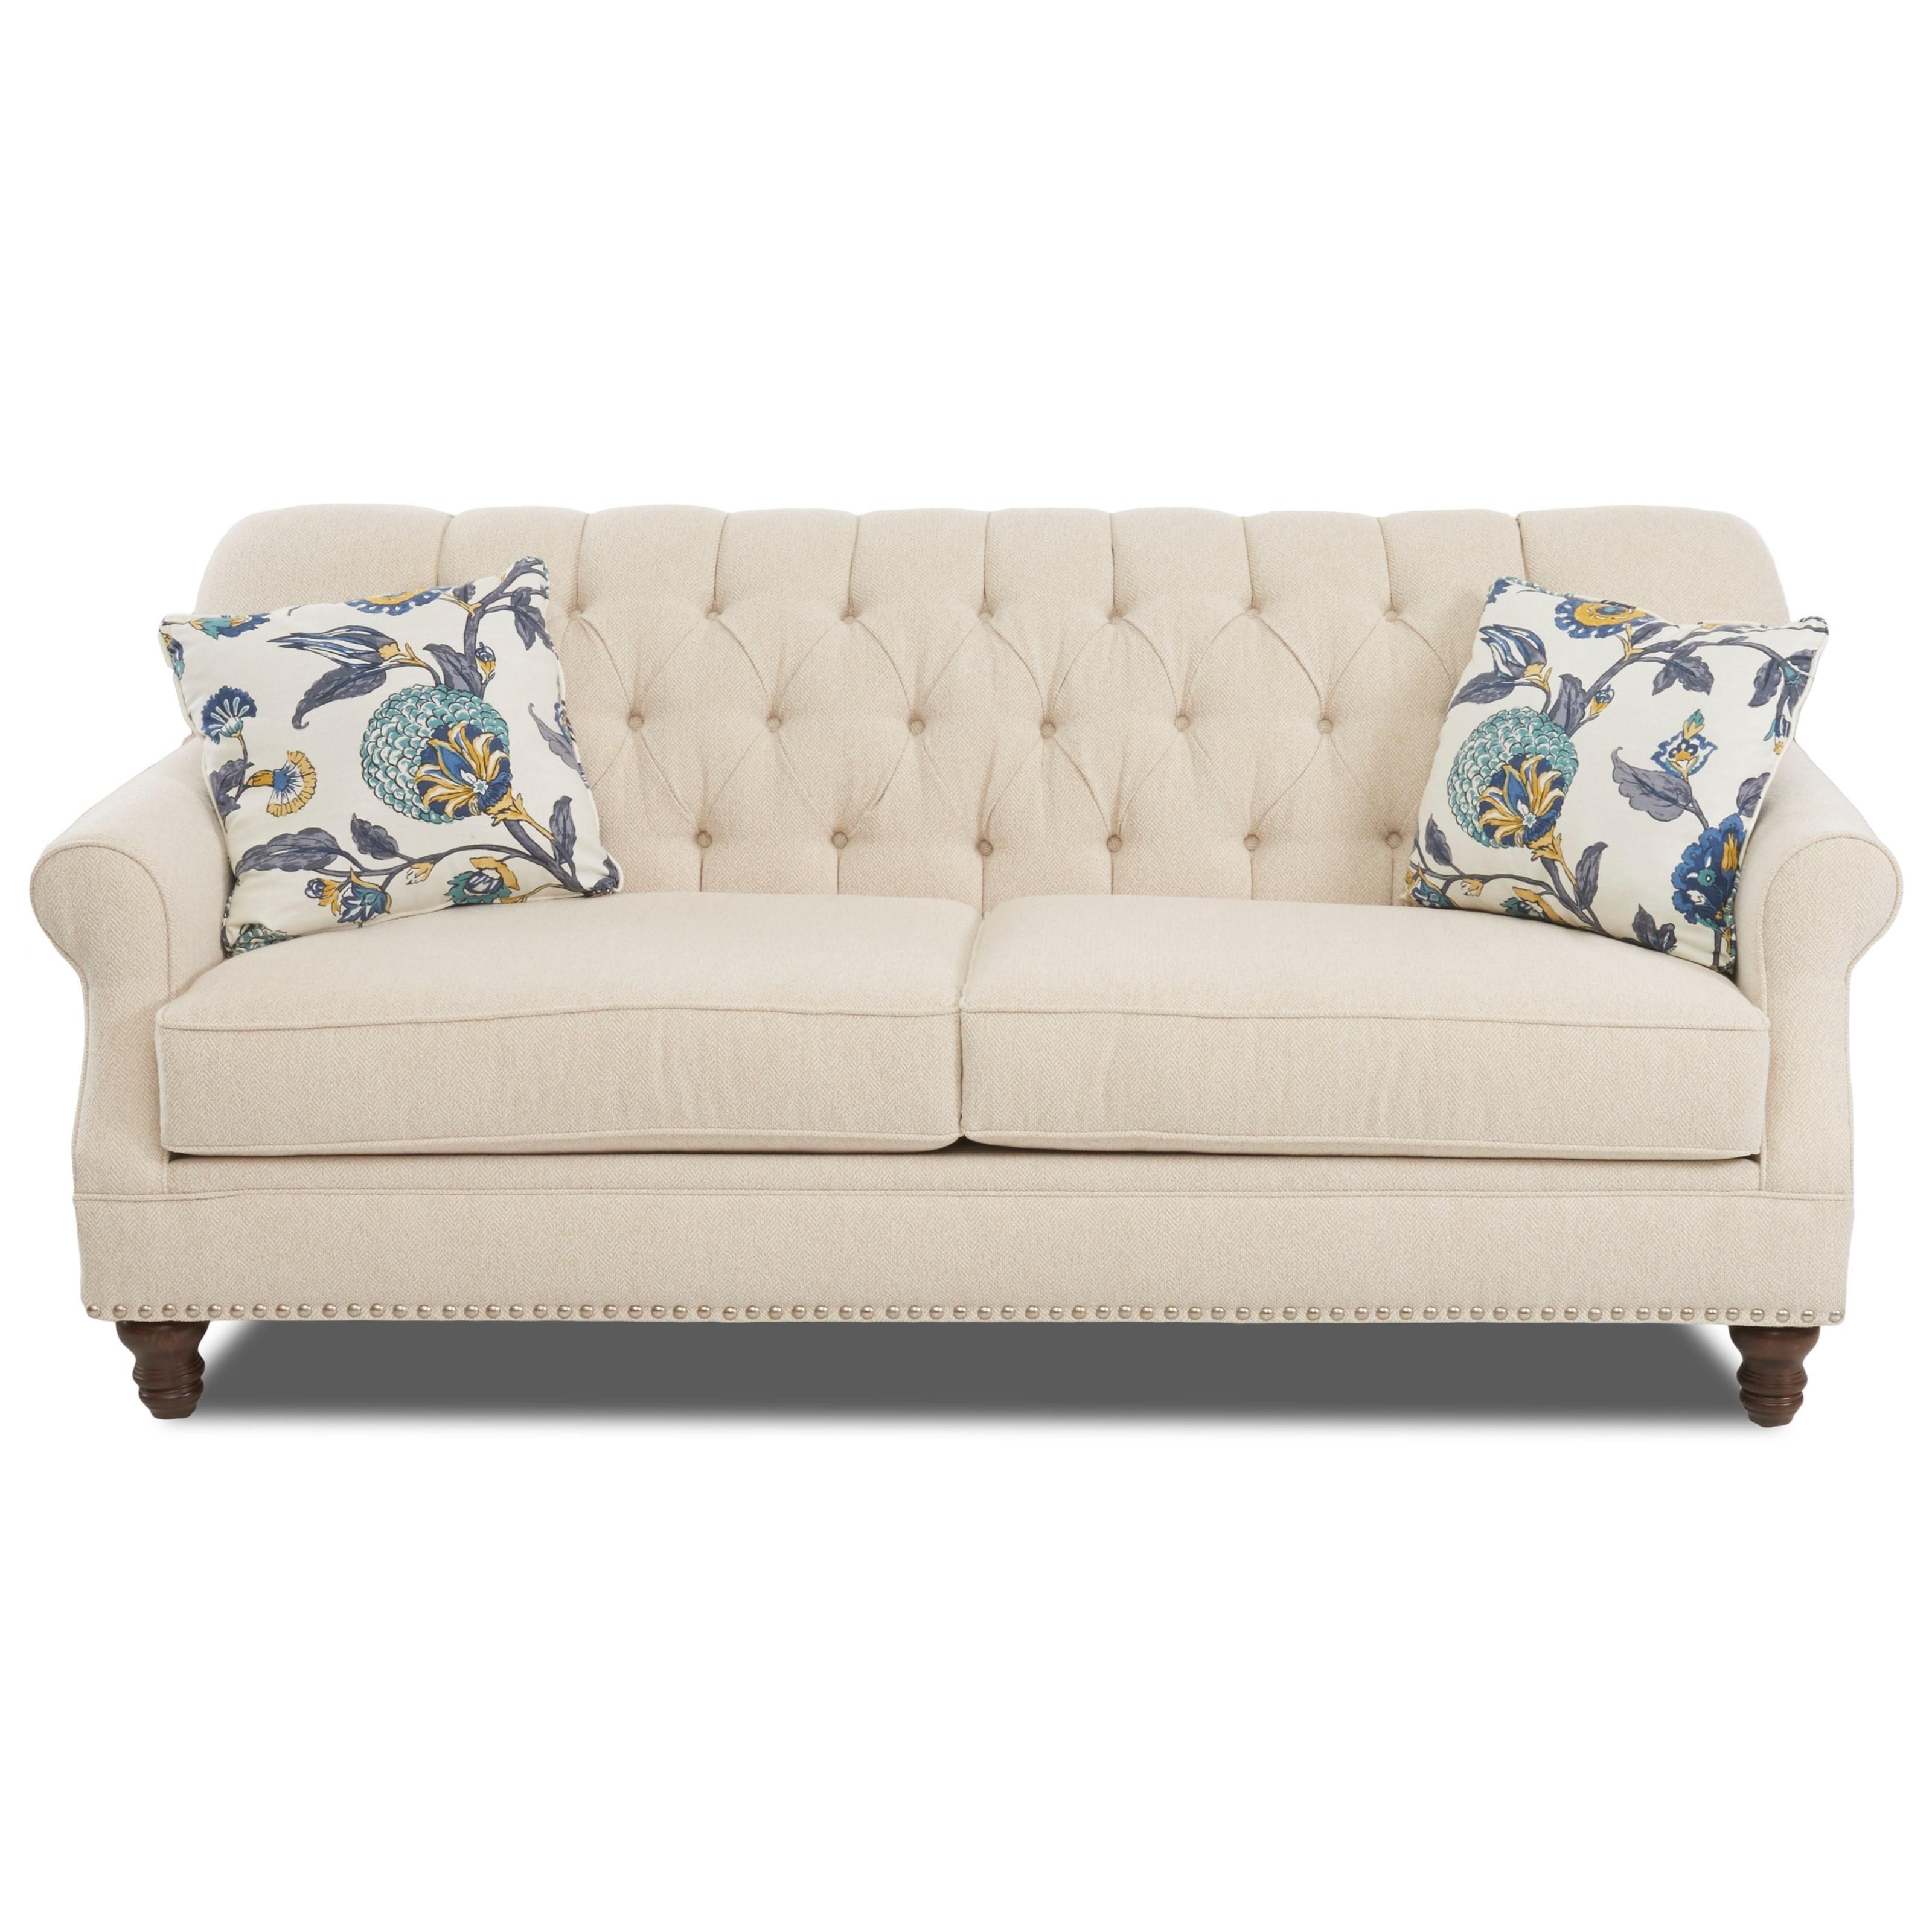 burbank sofa w nailheads